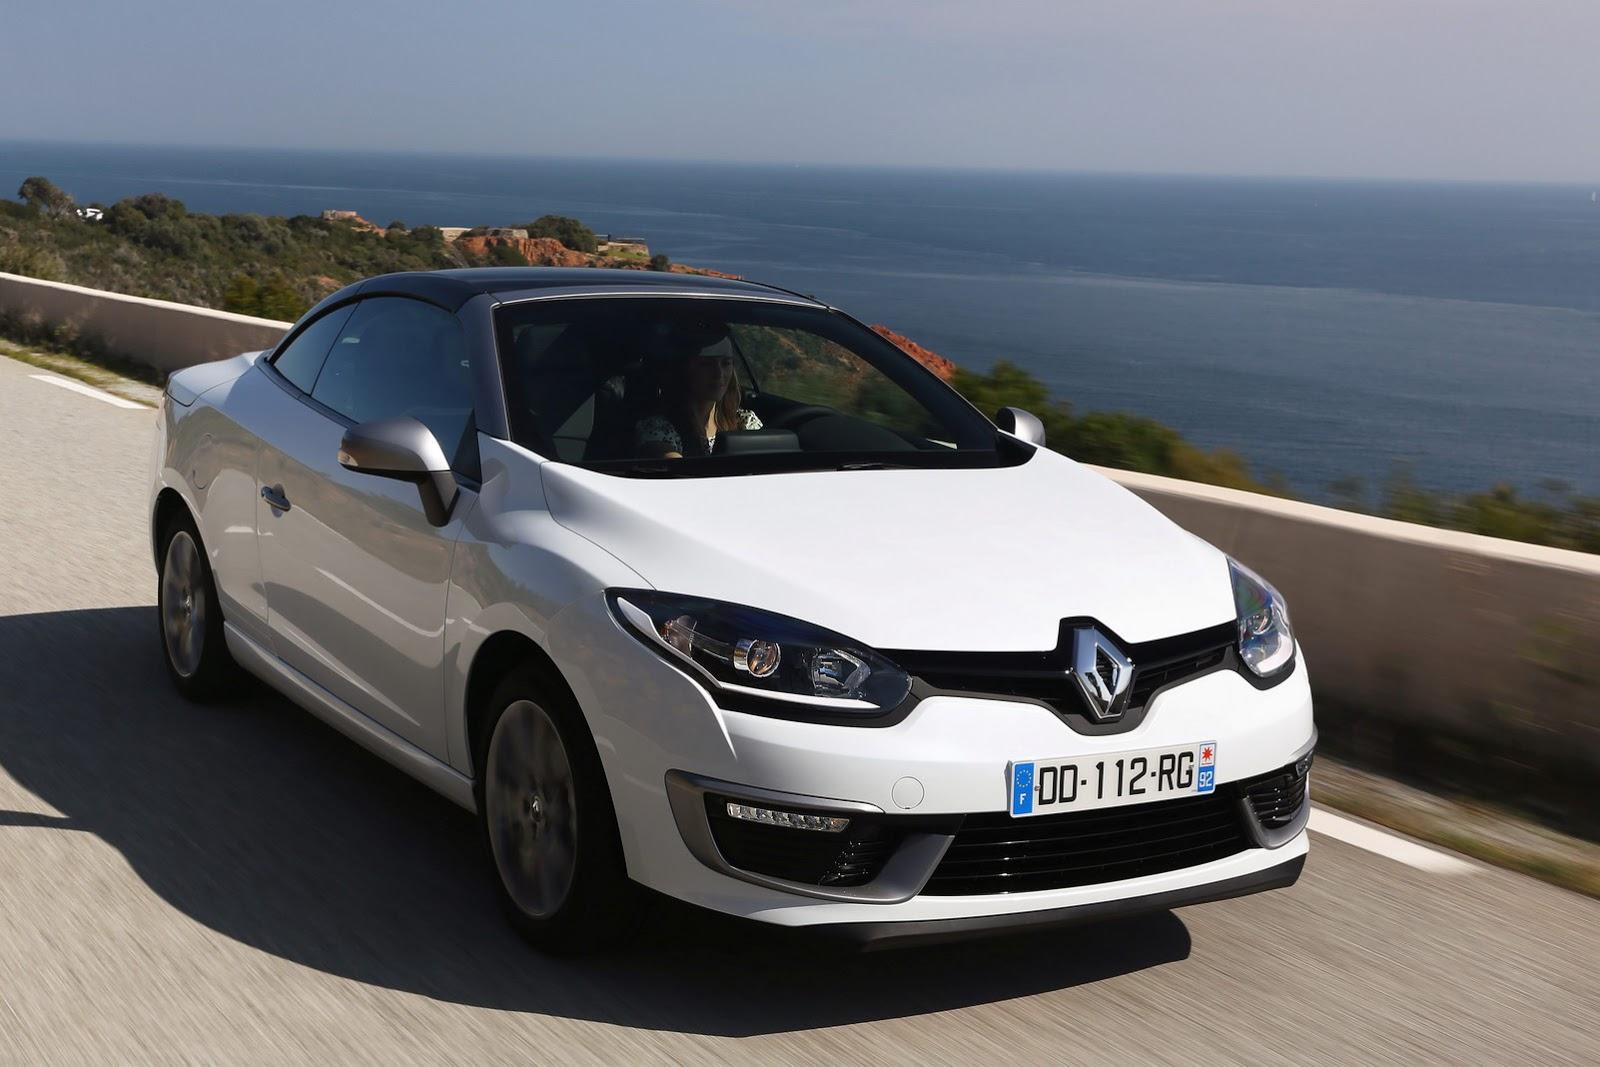 2014-Renault-Megane-FL-5